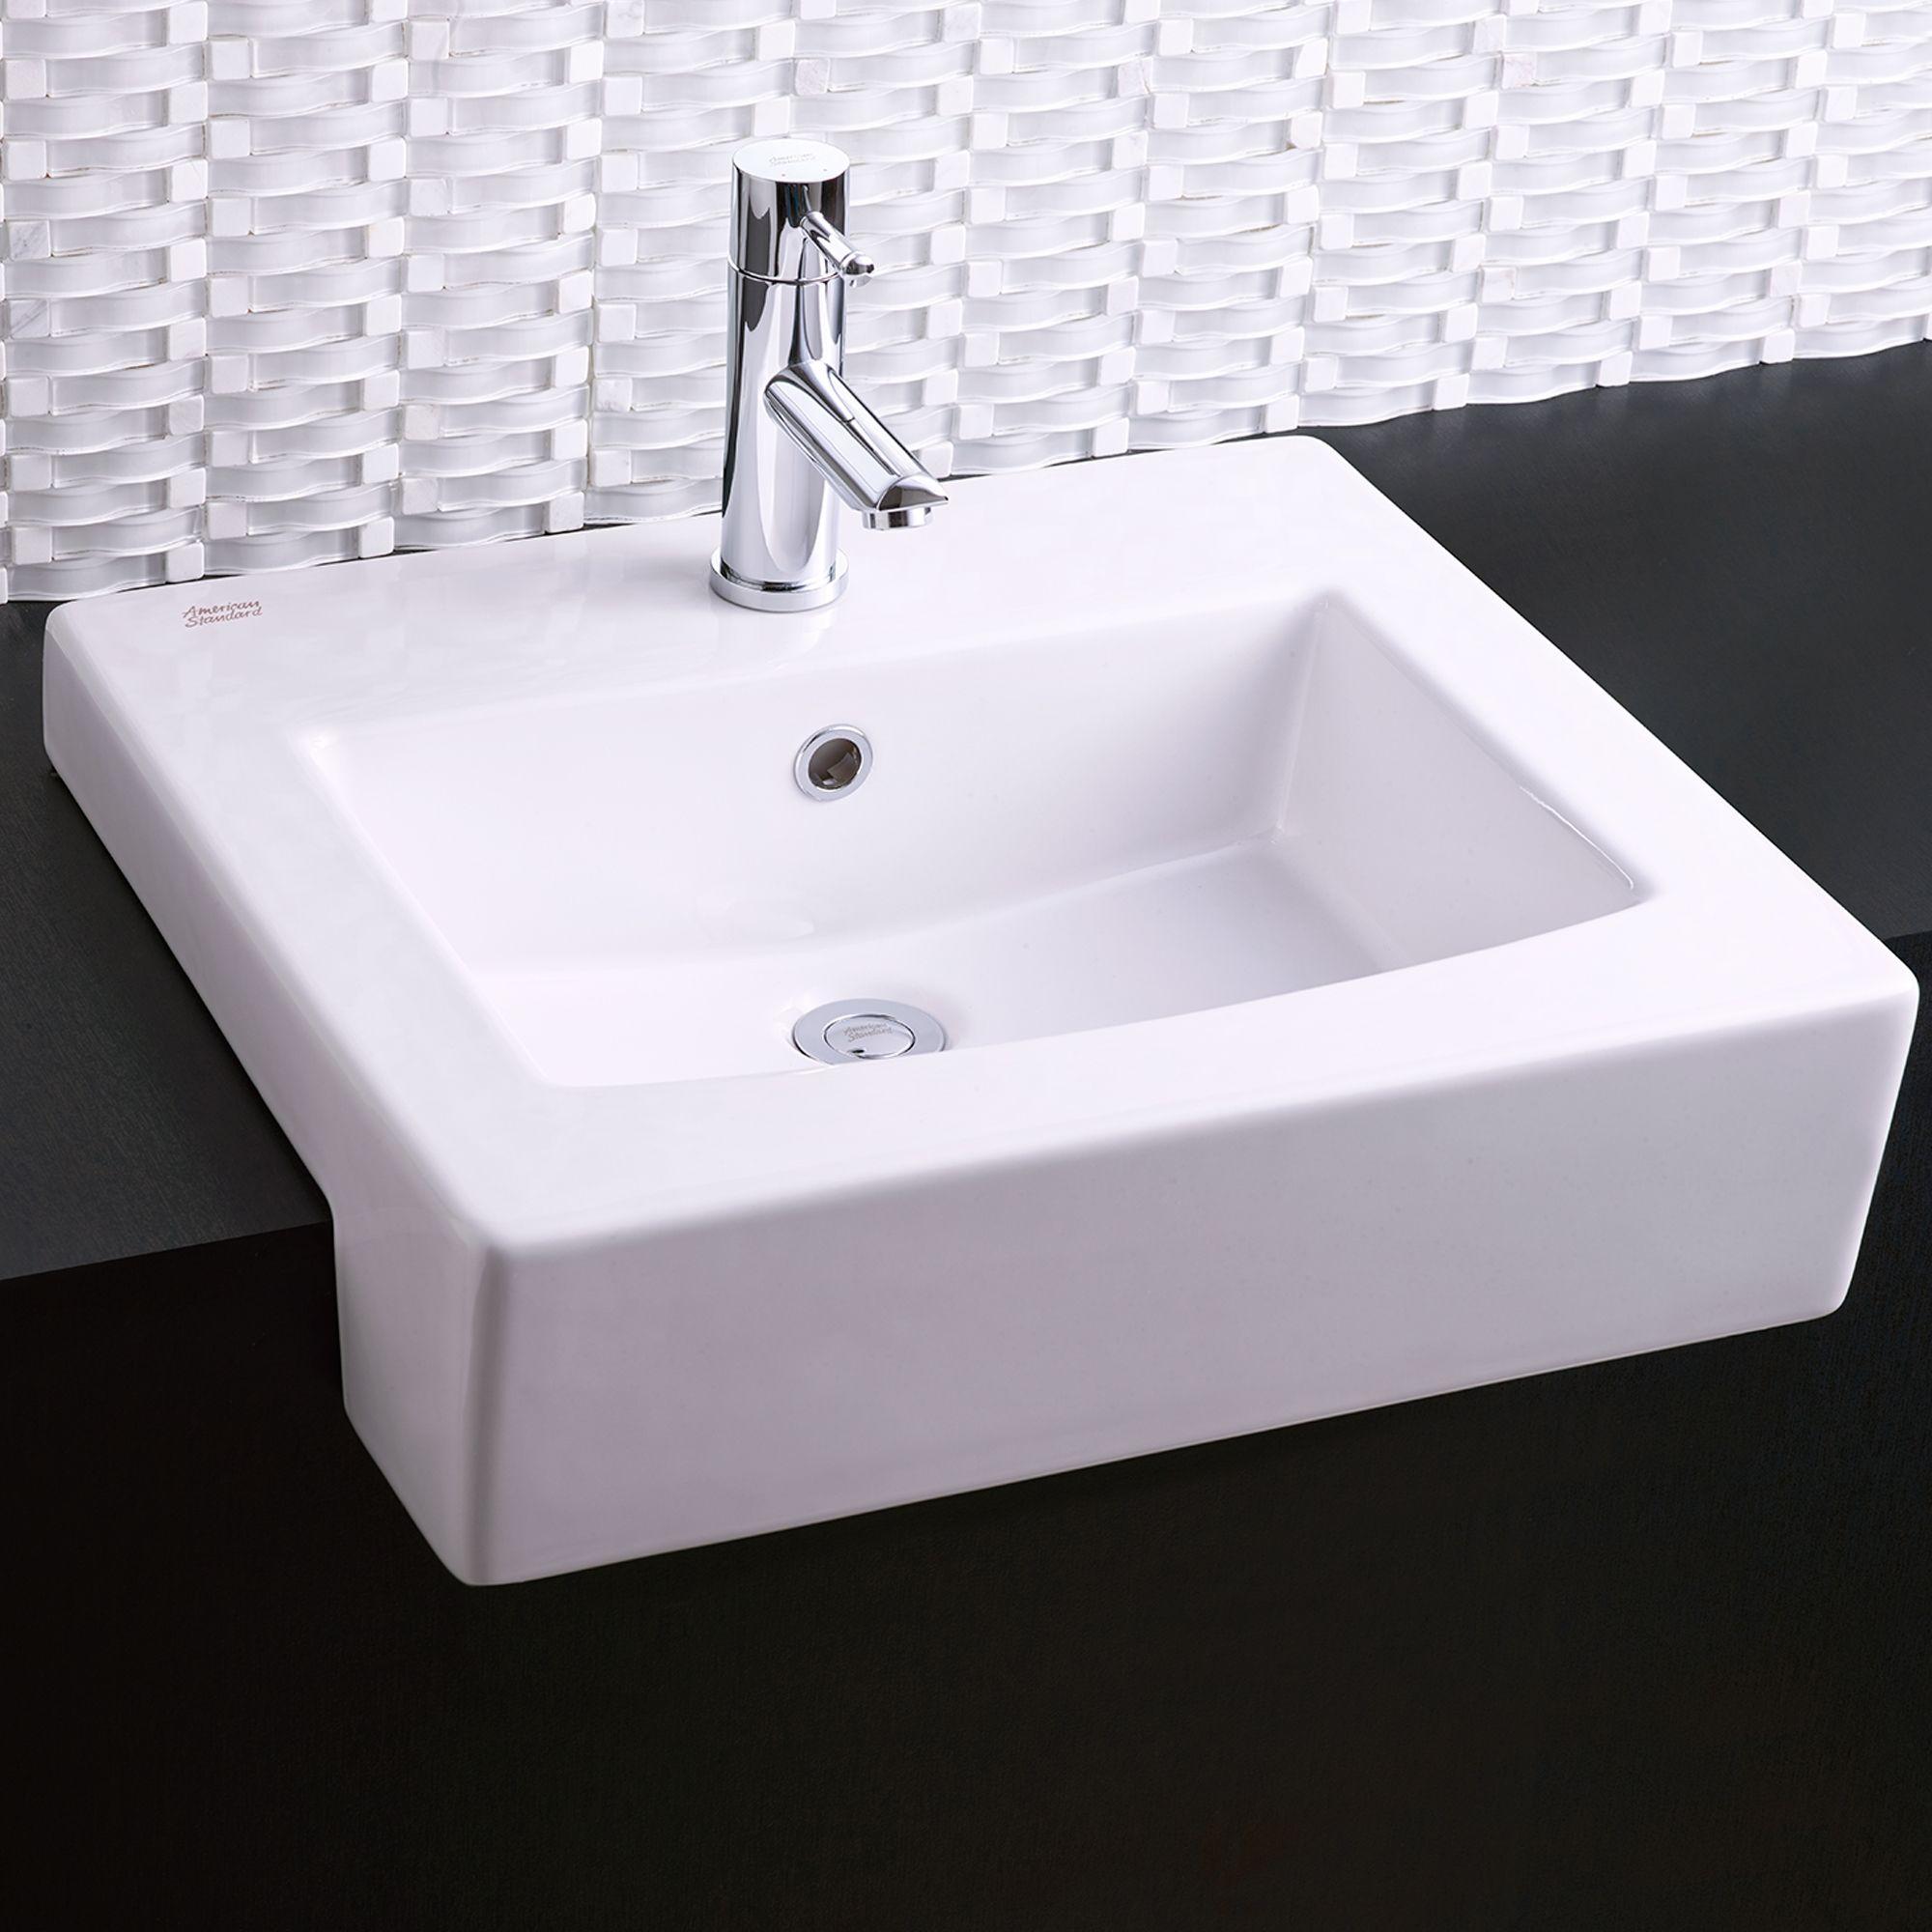 American Standard Rectangular Undermount Bathroom Sink Bathroom - American standard undermount bathroom sinks for bathroom decor ideas